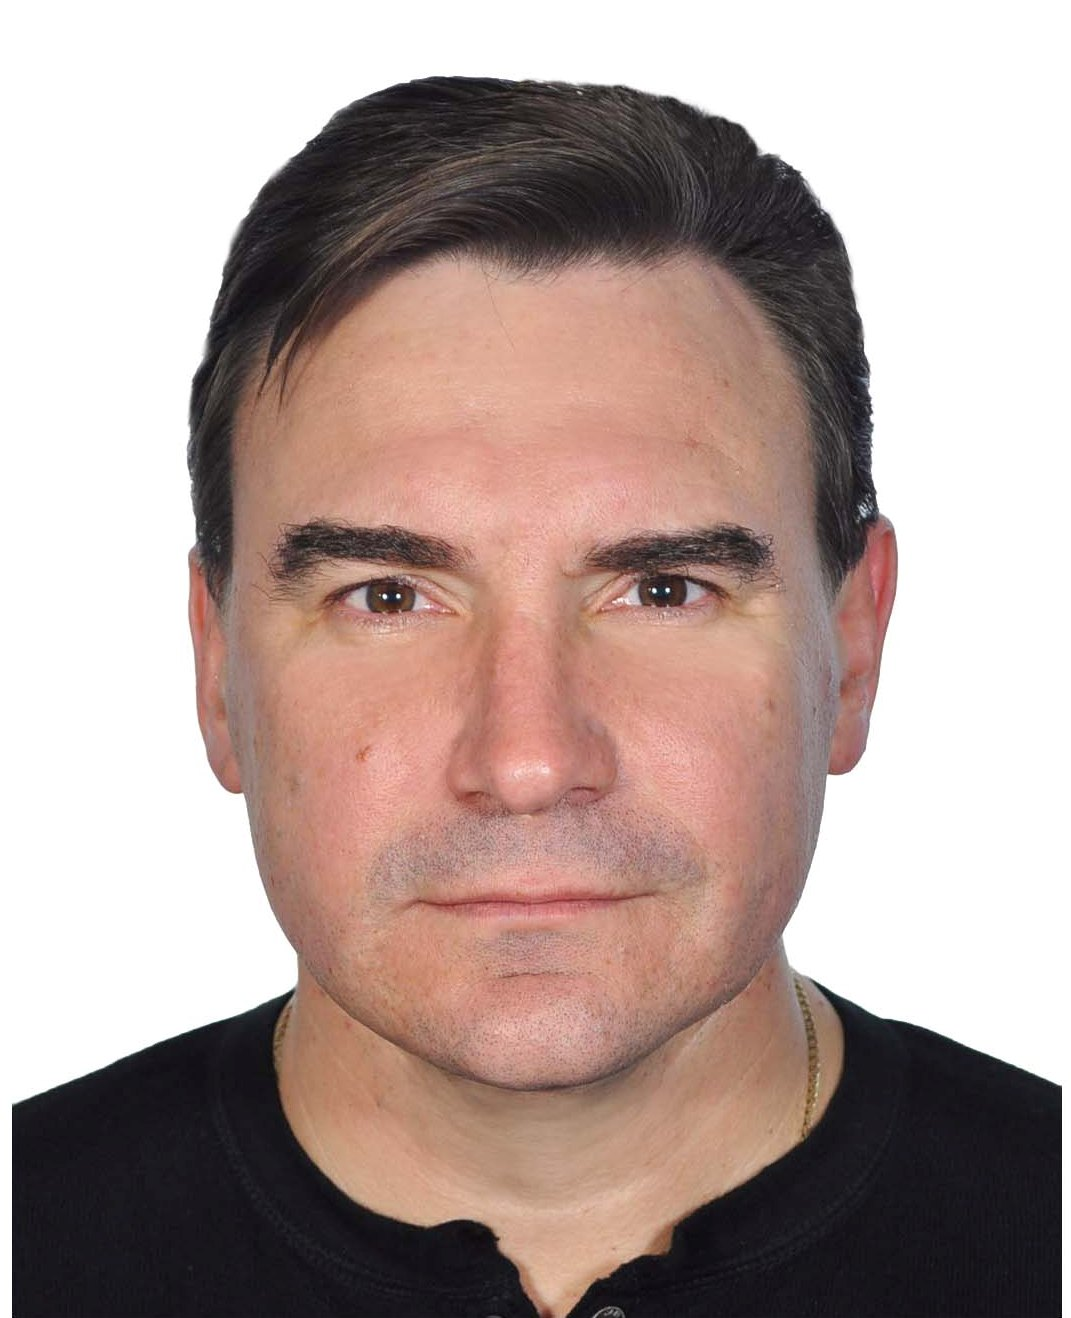 Востриков Вячеслав Валерьевич